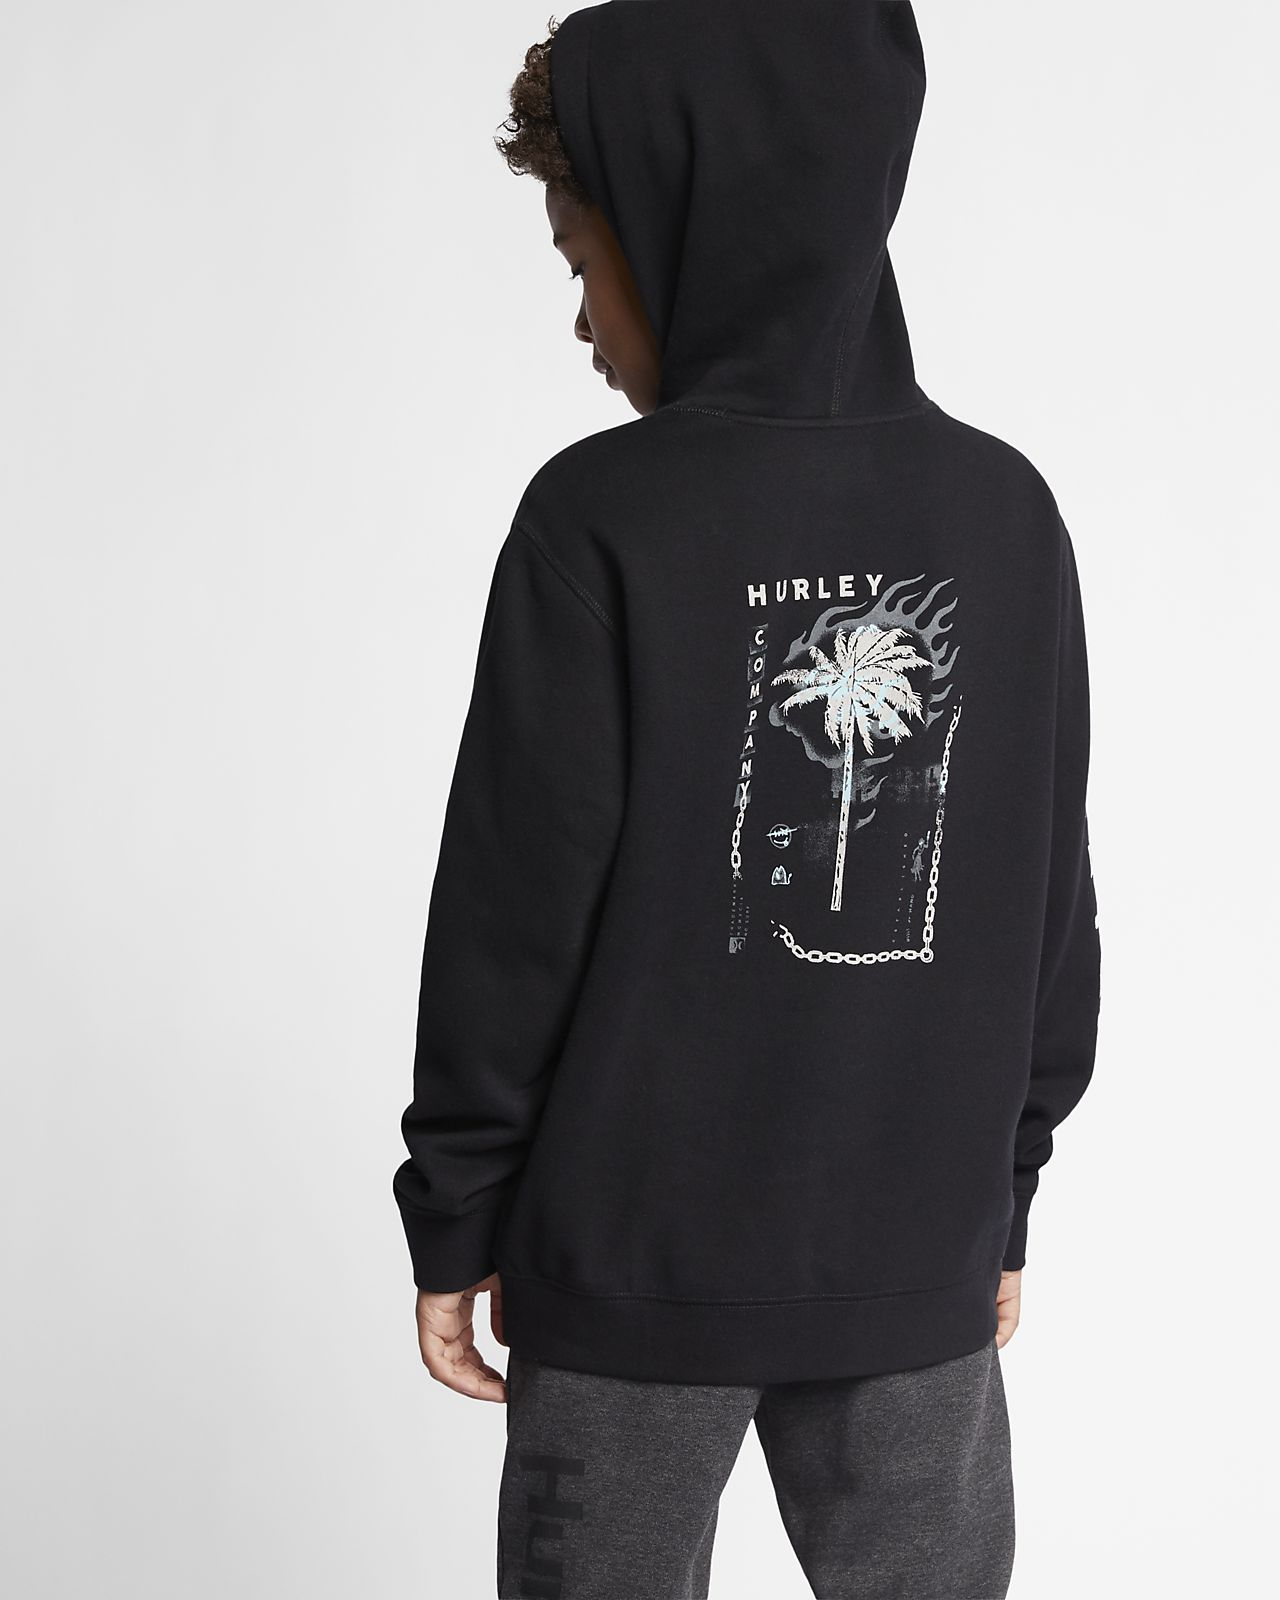 Hurley Burn Baby Boys' Fleece Pullover Hoodie